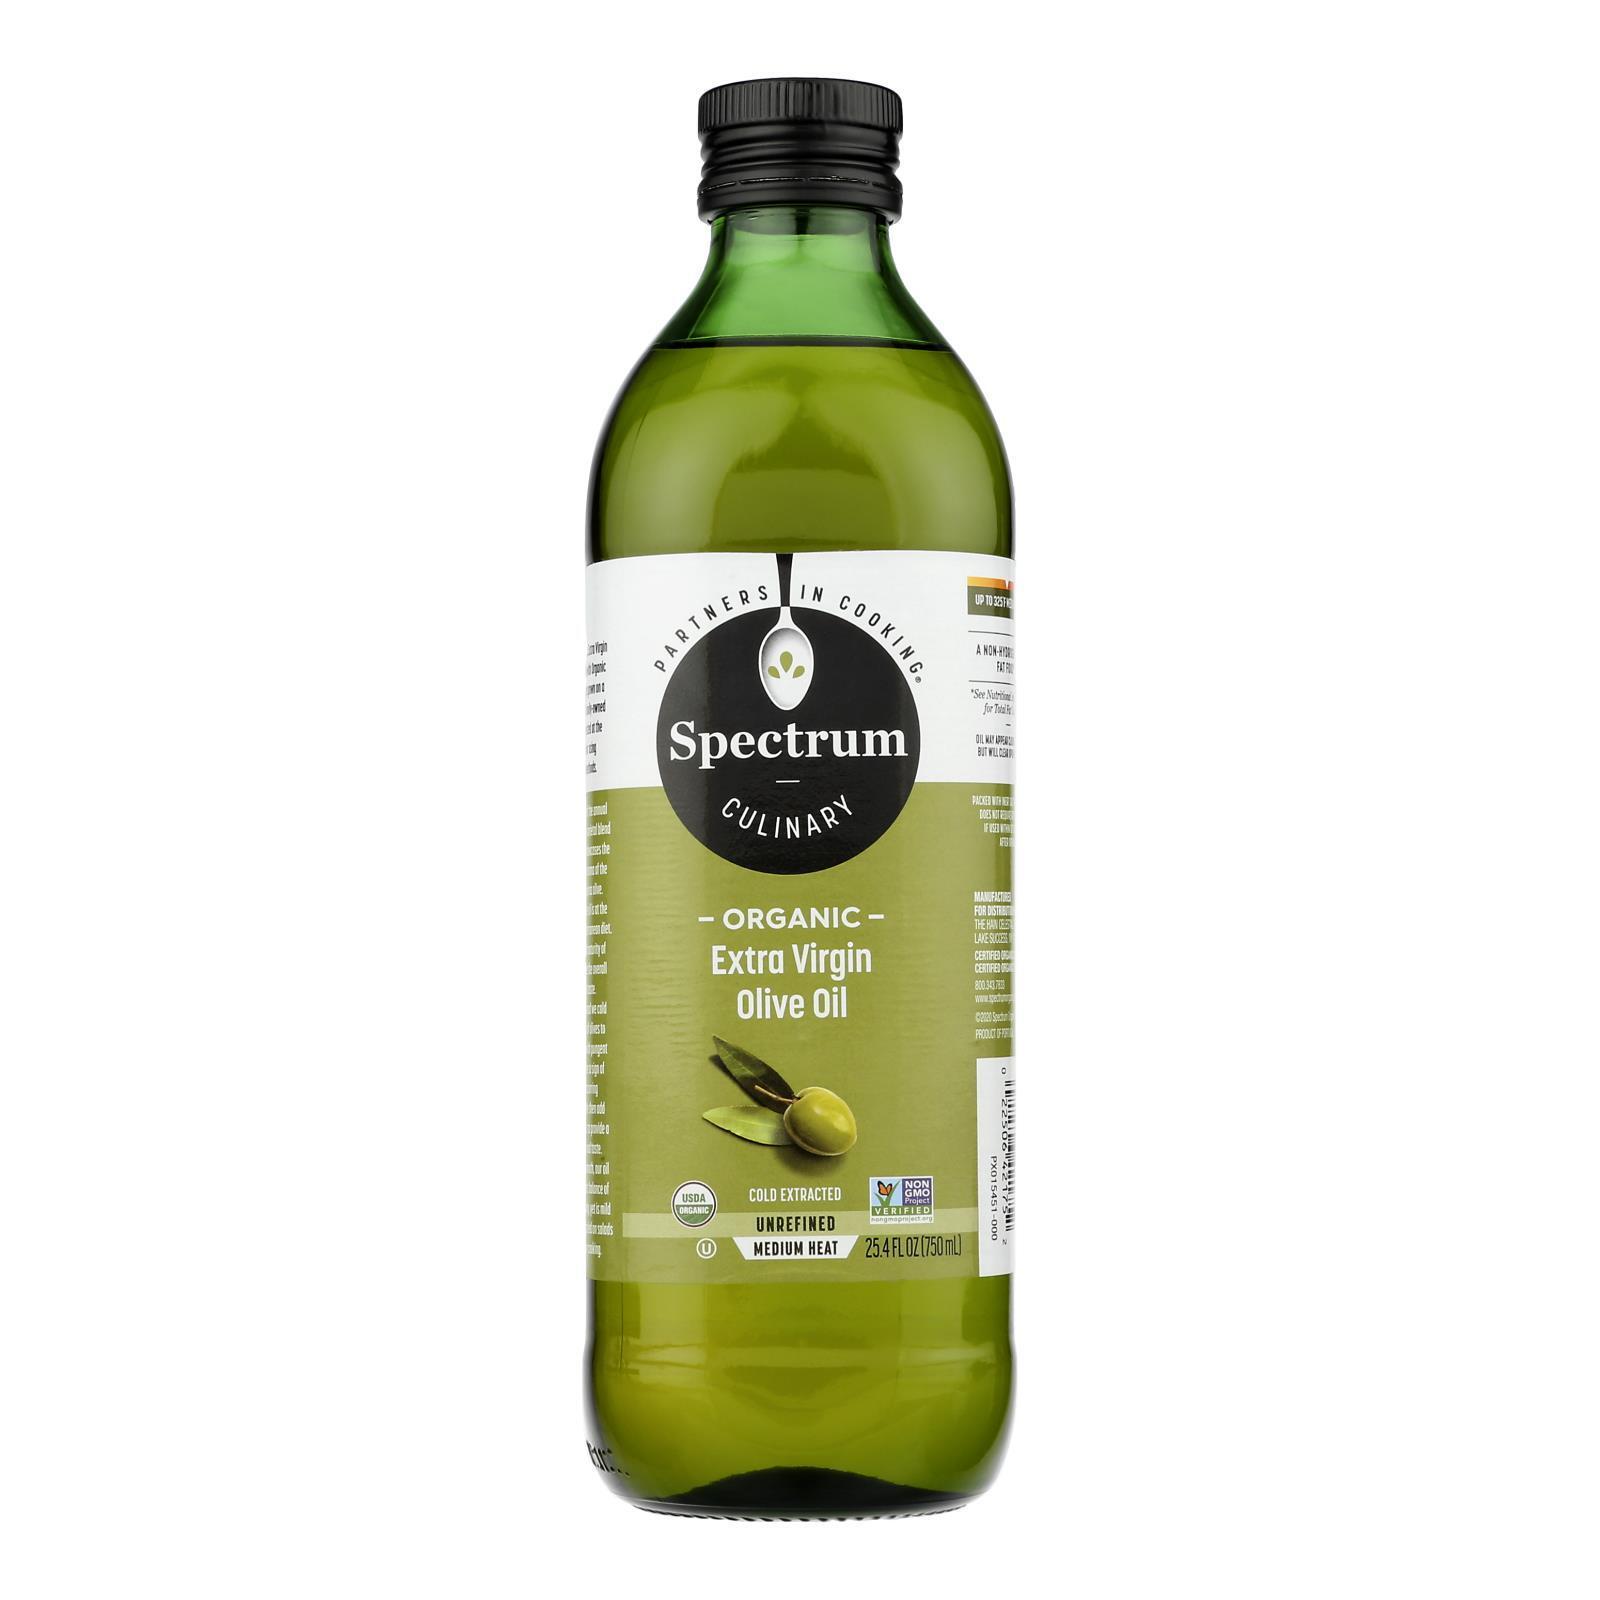 Spectrum Naturals Organic Unrefined Extra Virgin Olive Oil - Case of 6 - 25.4 Fl oz.